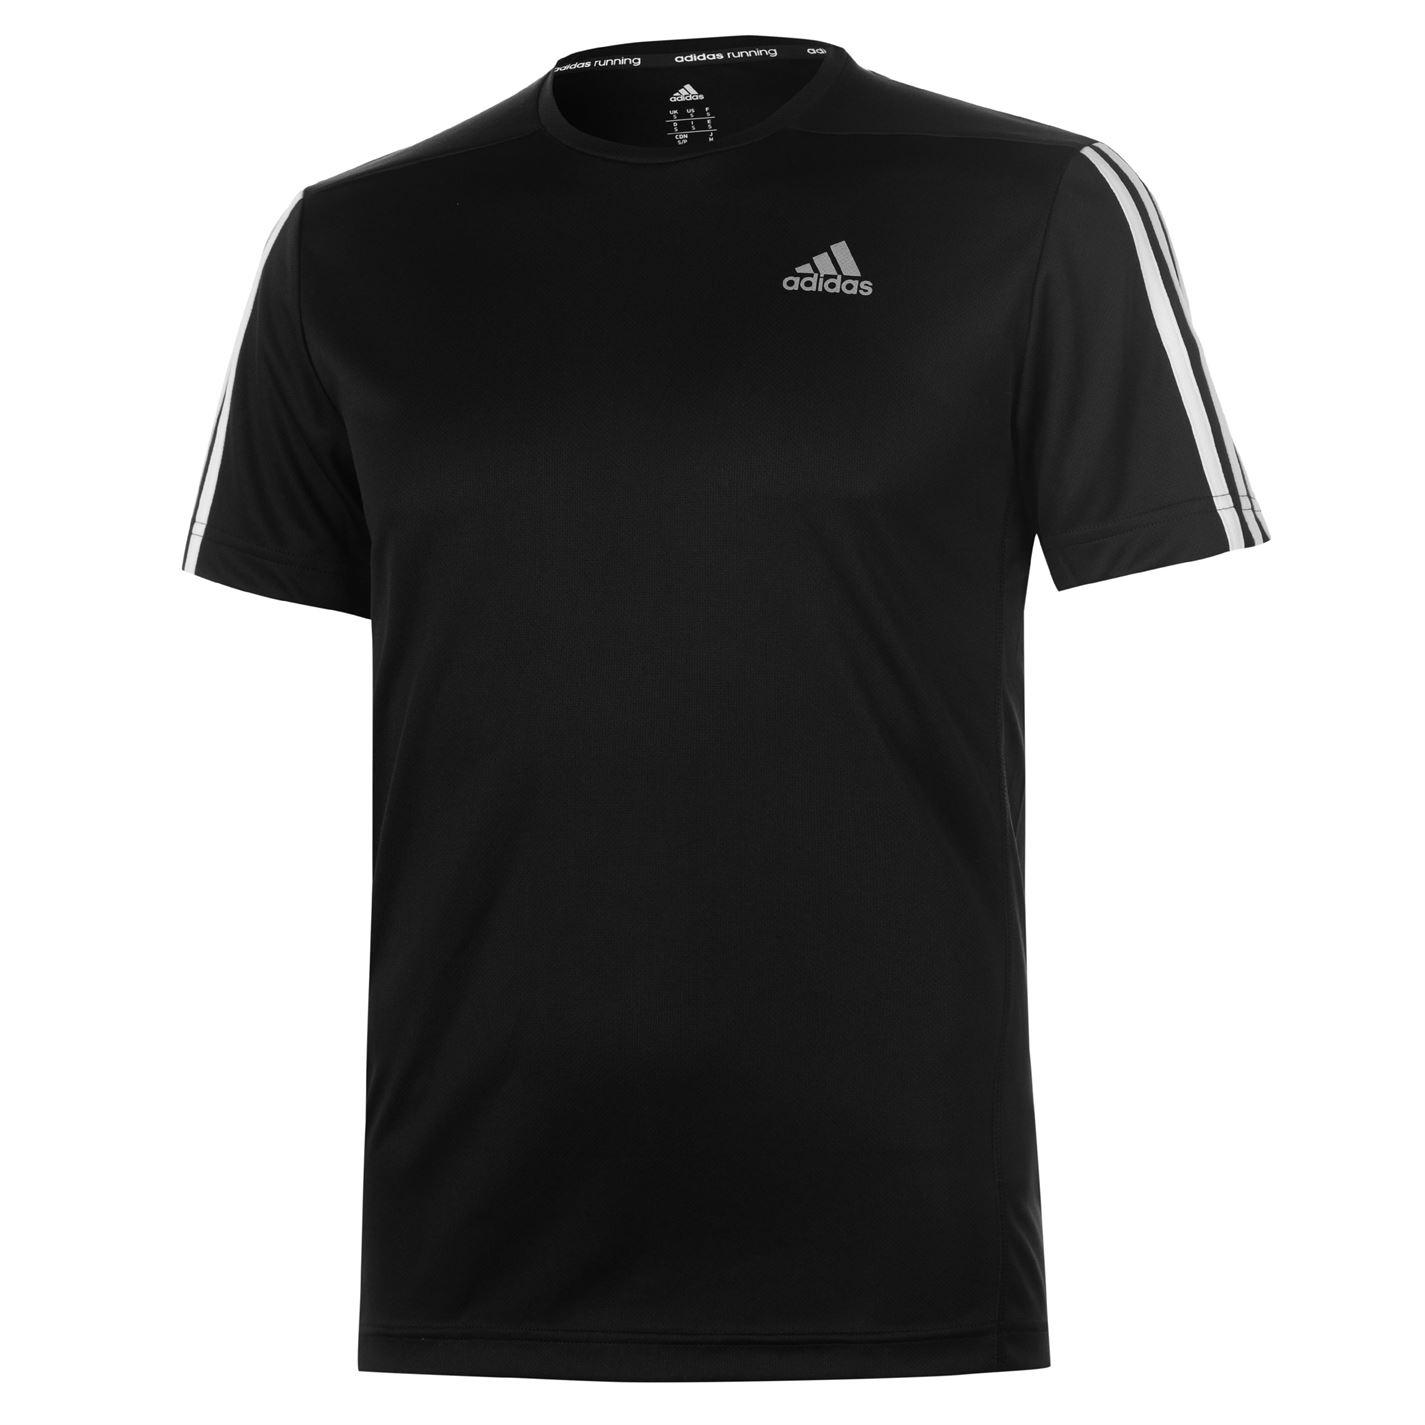 adidas Questar T Shirt Mens